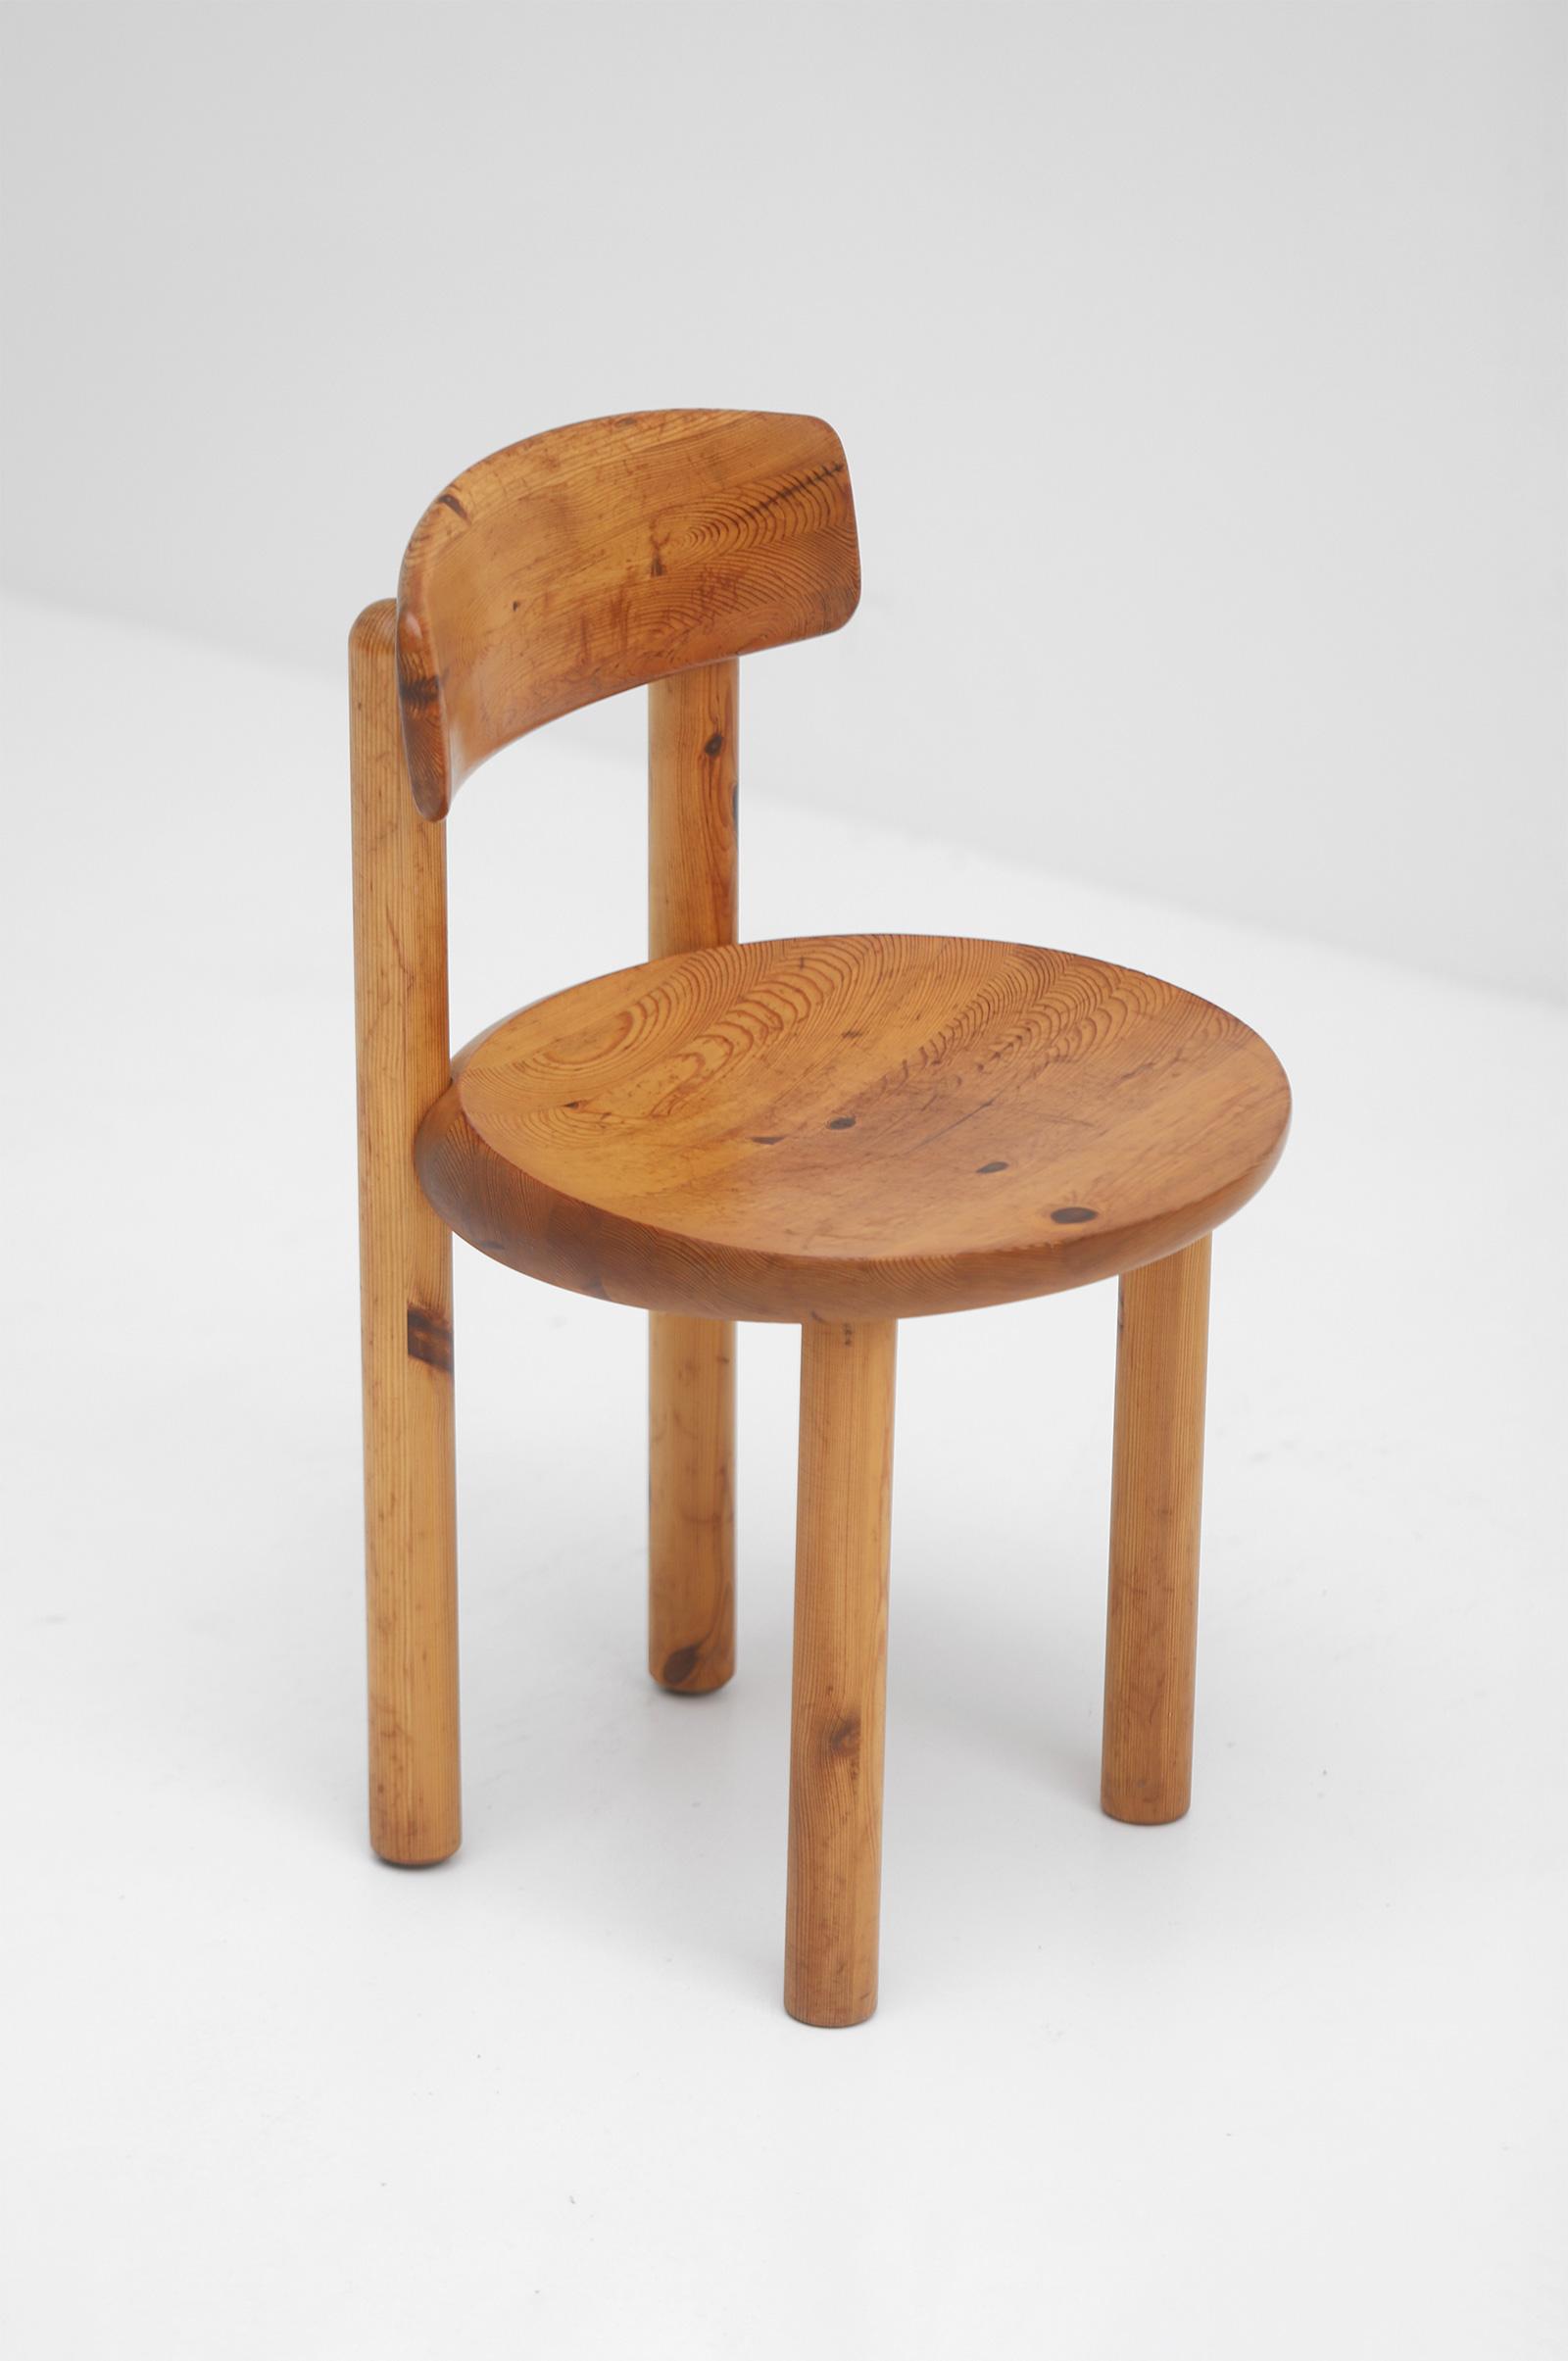 5 Daumiller Pinewood Chairsimage 7